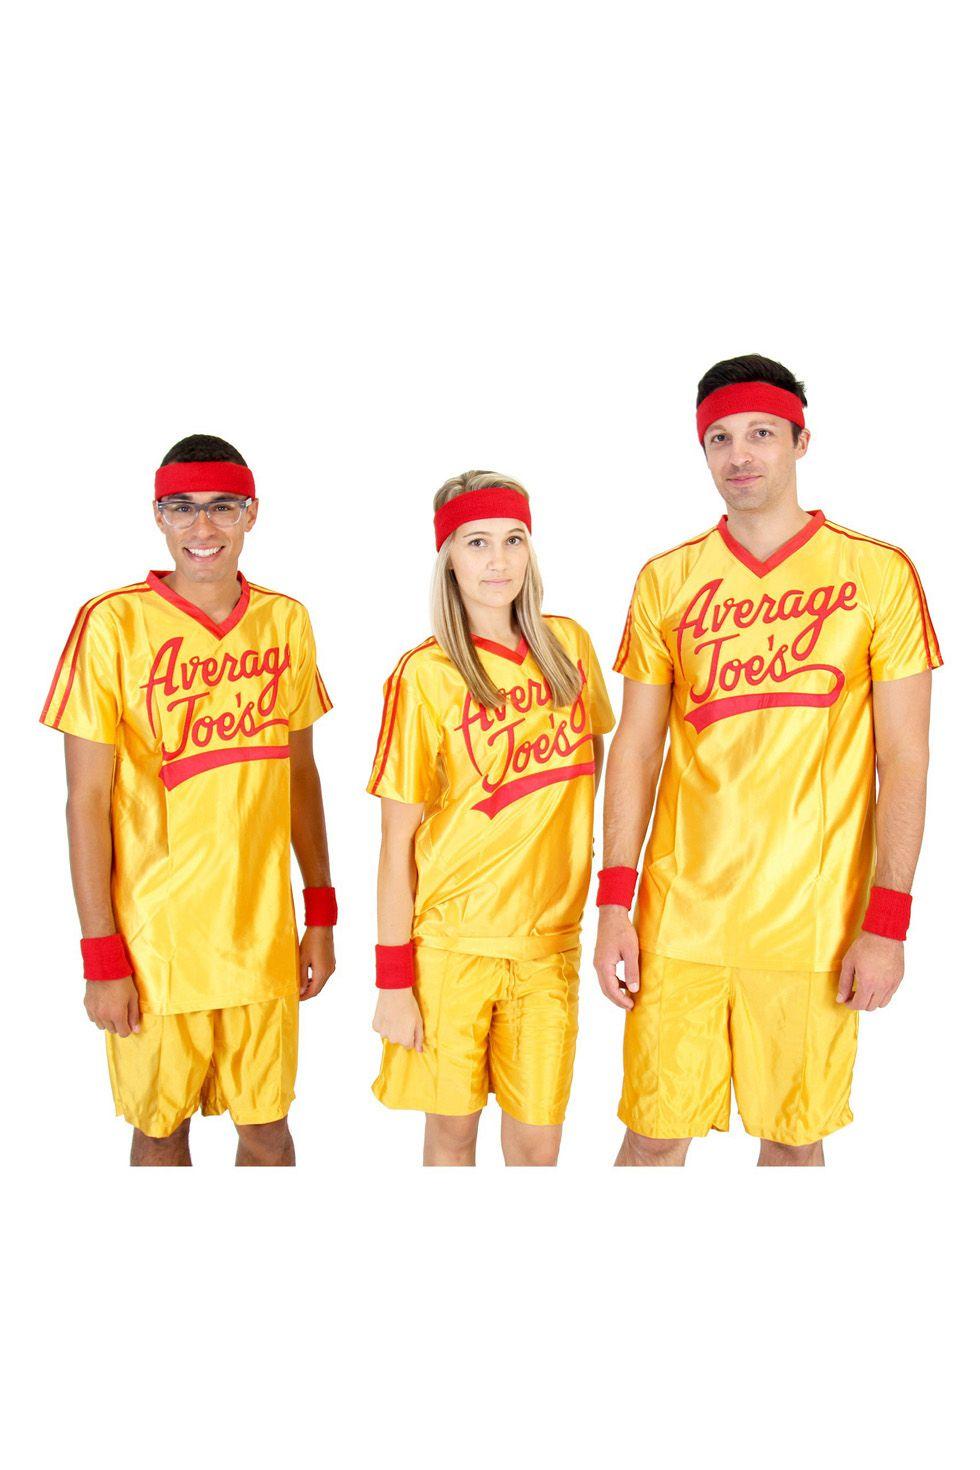 401b530f1de 25 Cute Group Halloween Costume Ideas - Easy DIY Friend Halloween Costumes